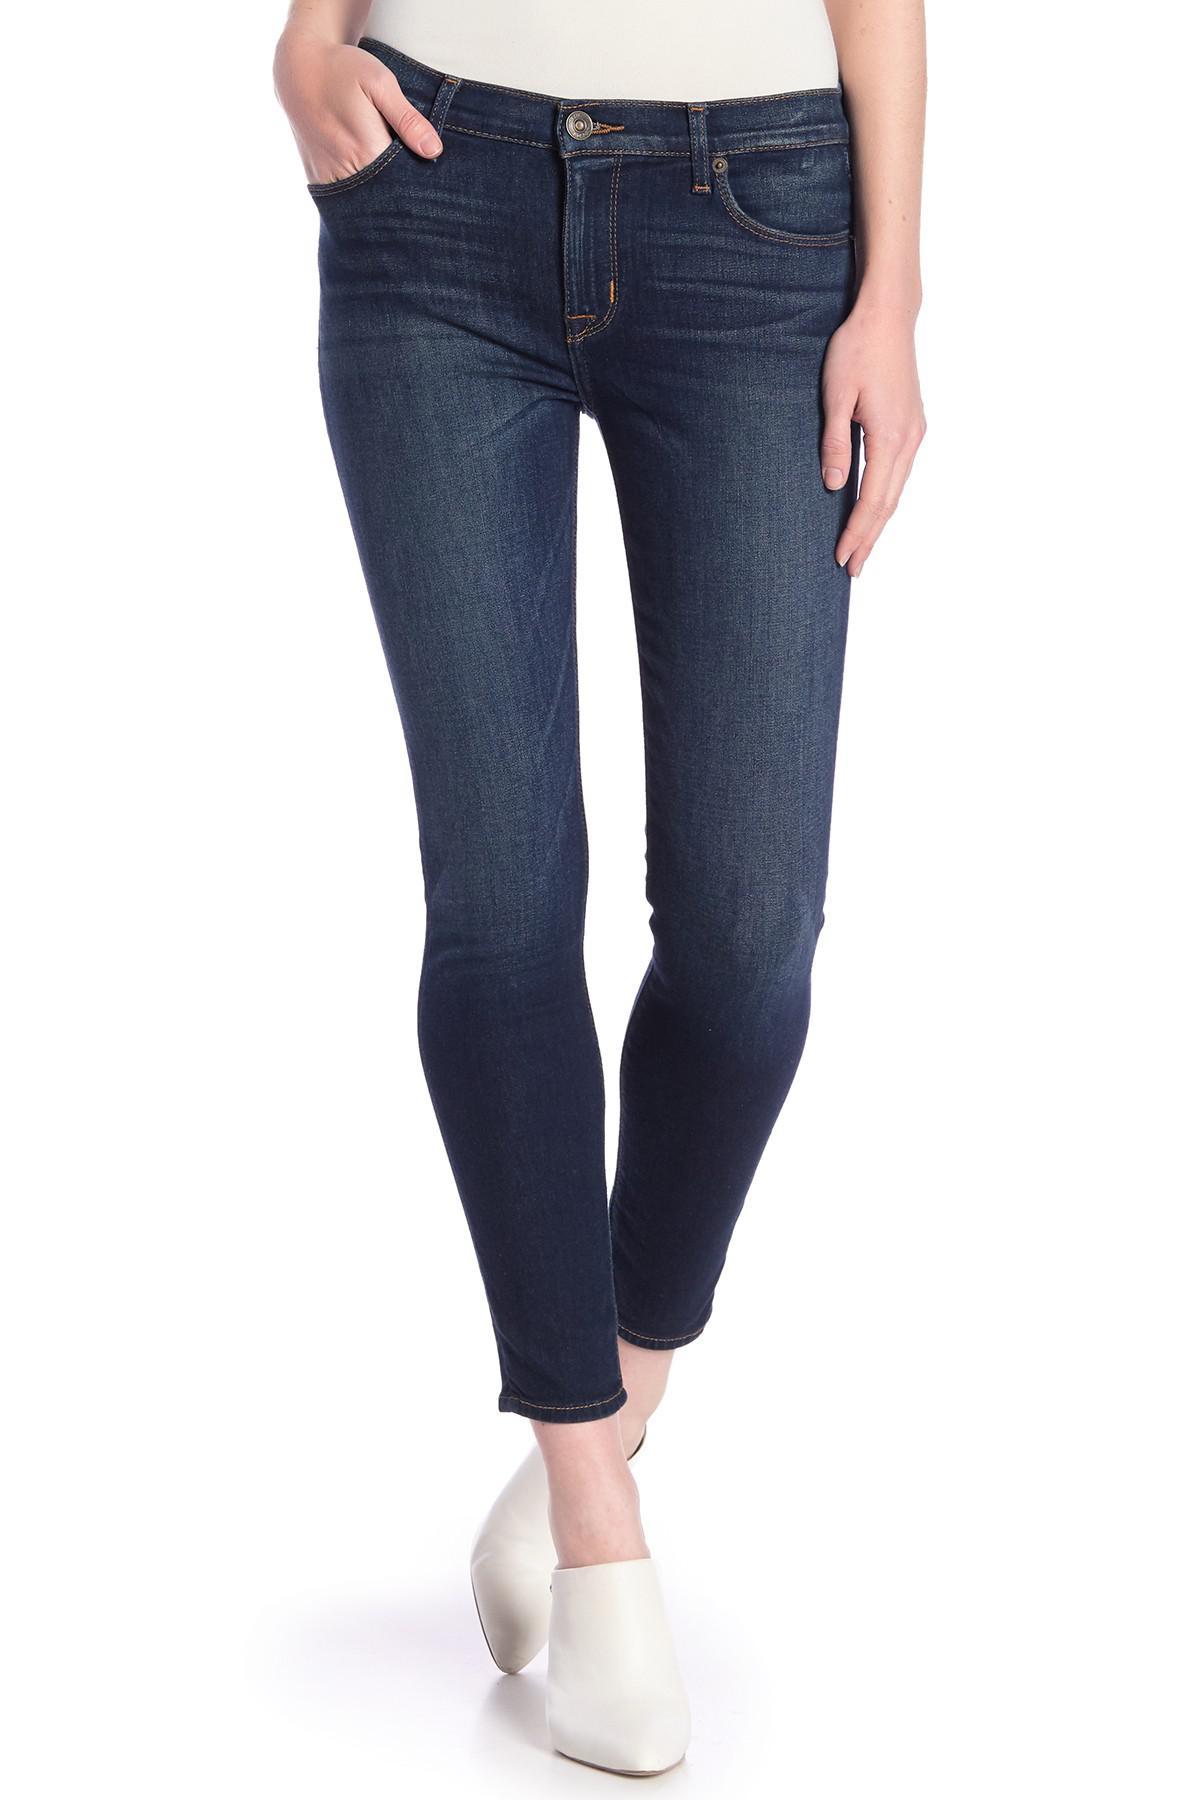 f8ebb14f4d8fe Hudson Jeans. Women s Blue Natalie Mid Rise Ankle Super Skinny Jeans.  189   90 From Nordstrom Rack